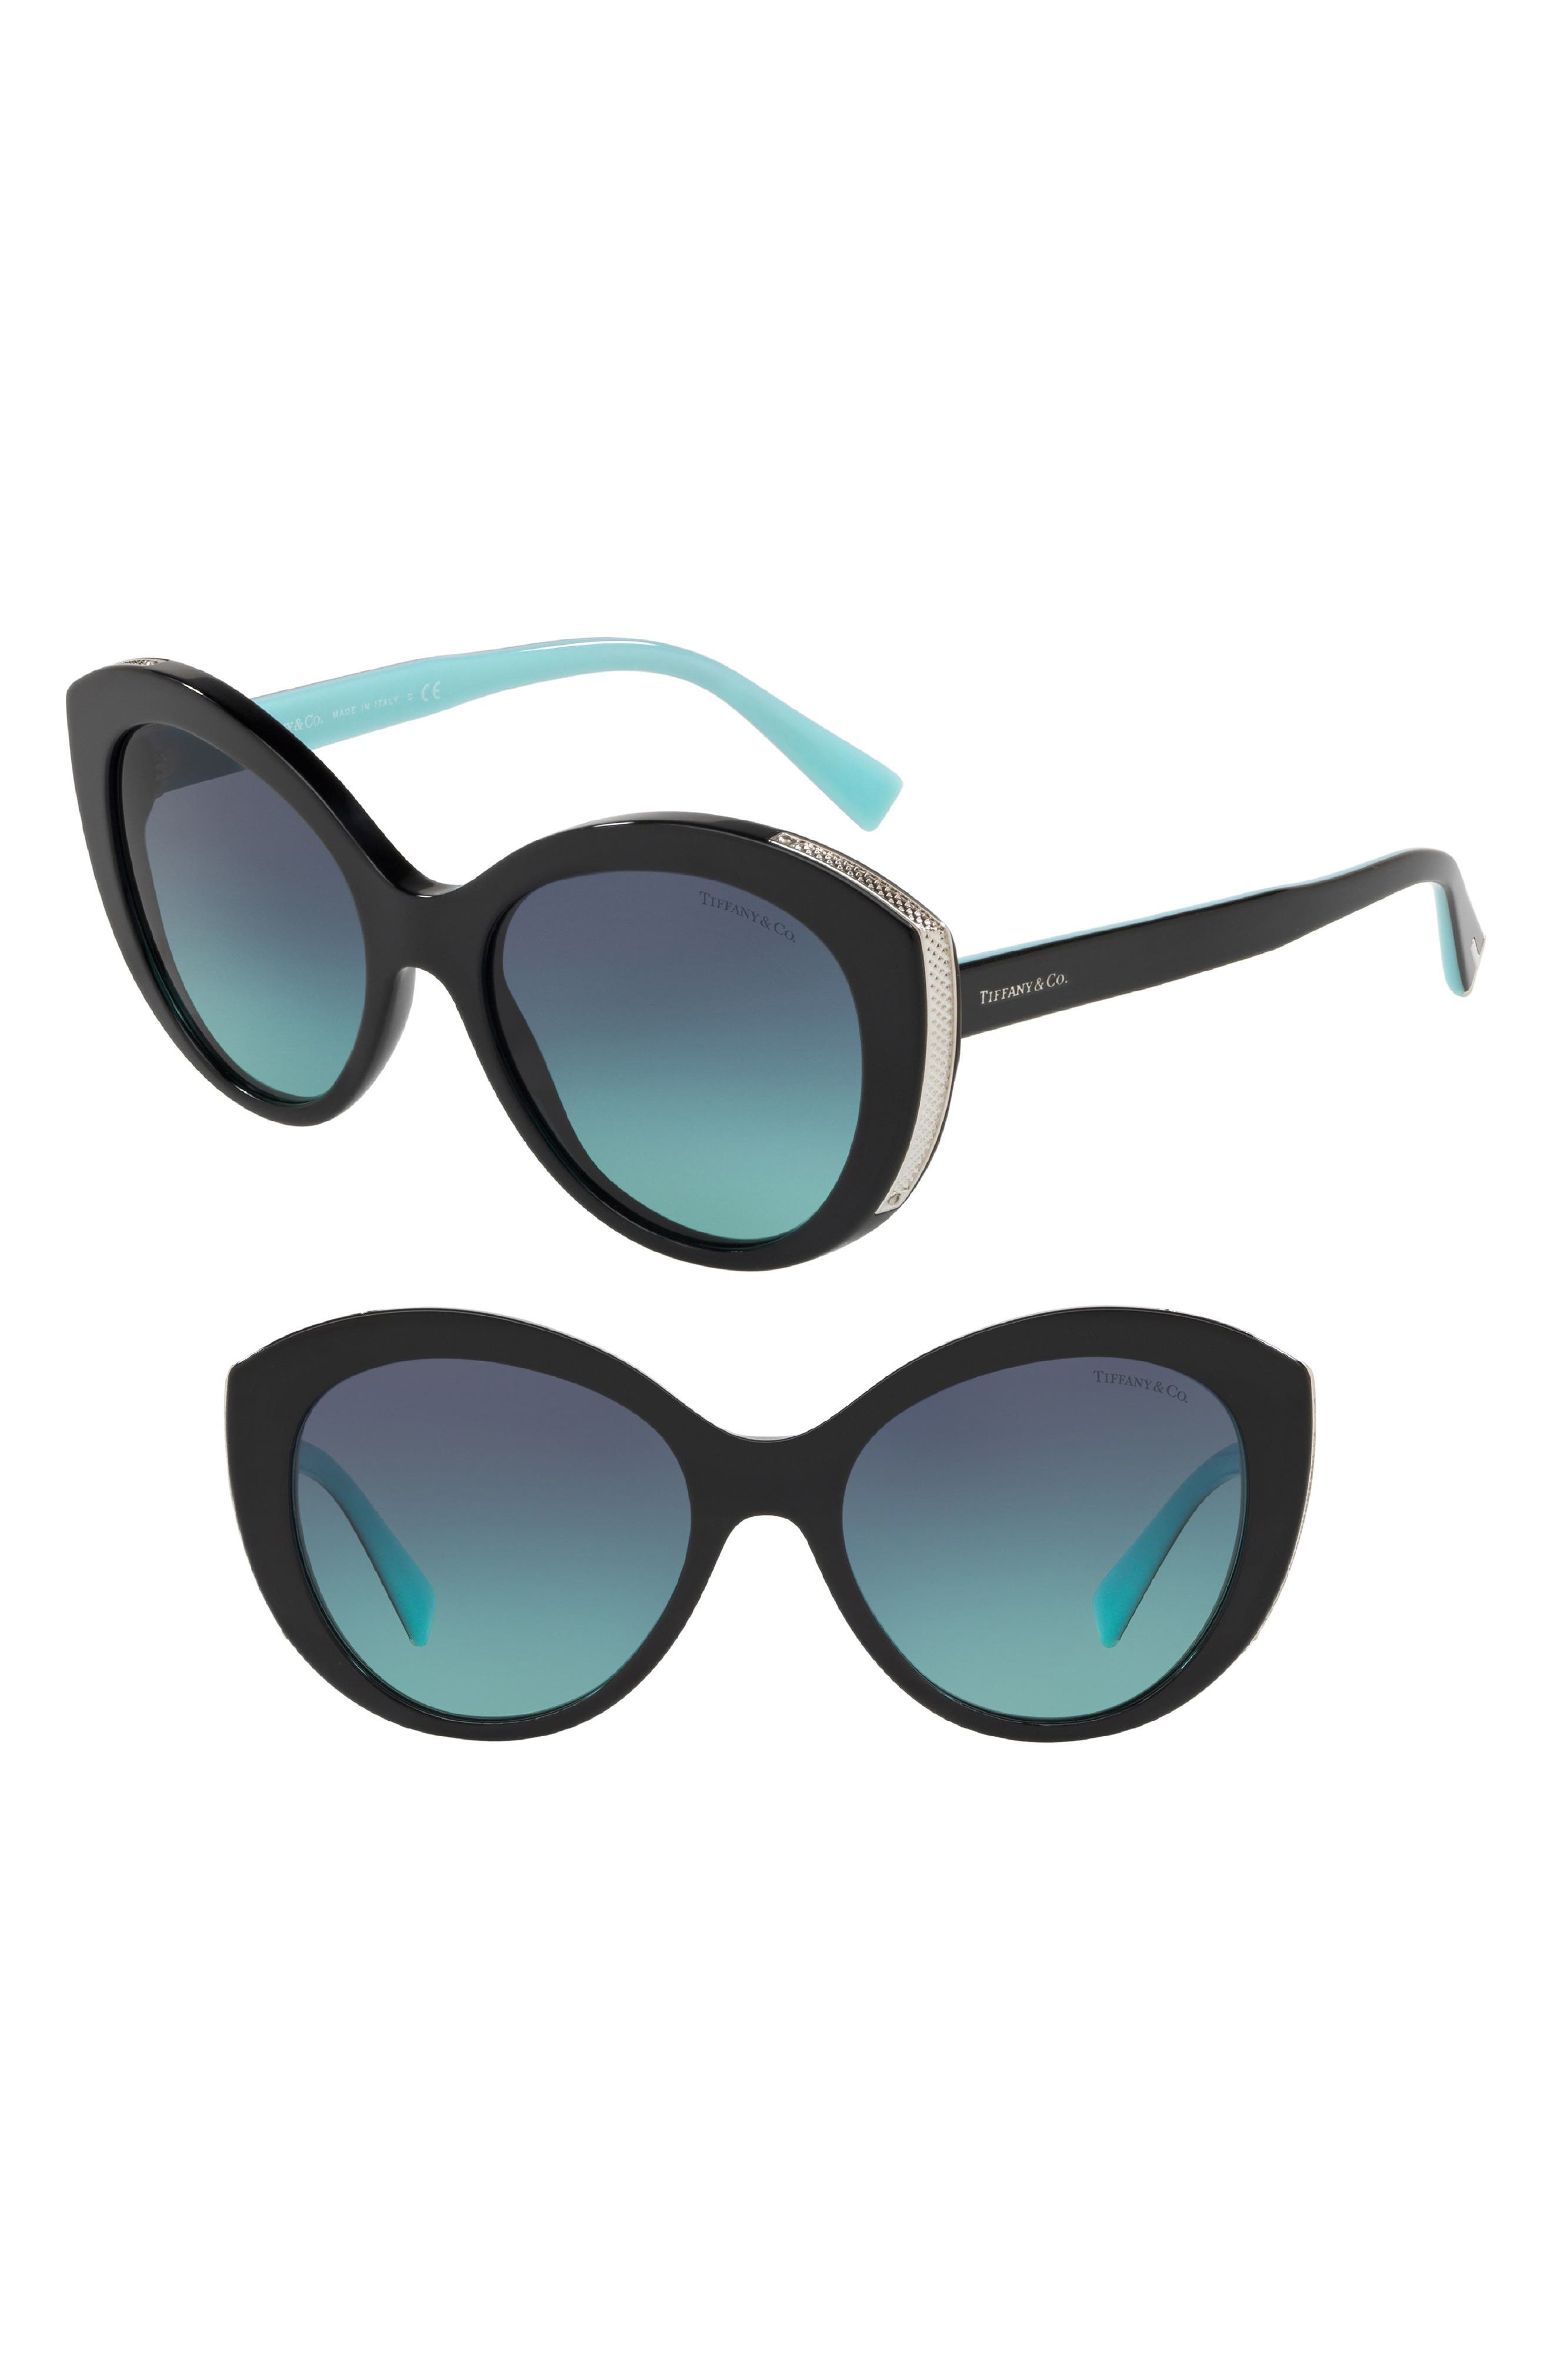 Diamond Point 54mm Gradient Round Sunglasses,                             Main thumbnail 1, color,                             BLACK GRADIENT